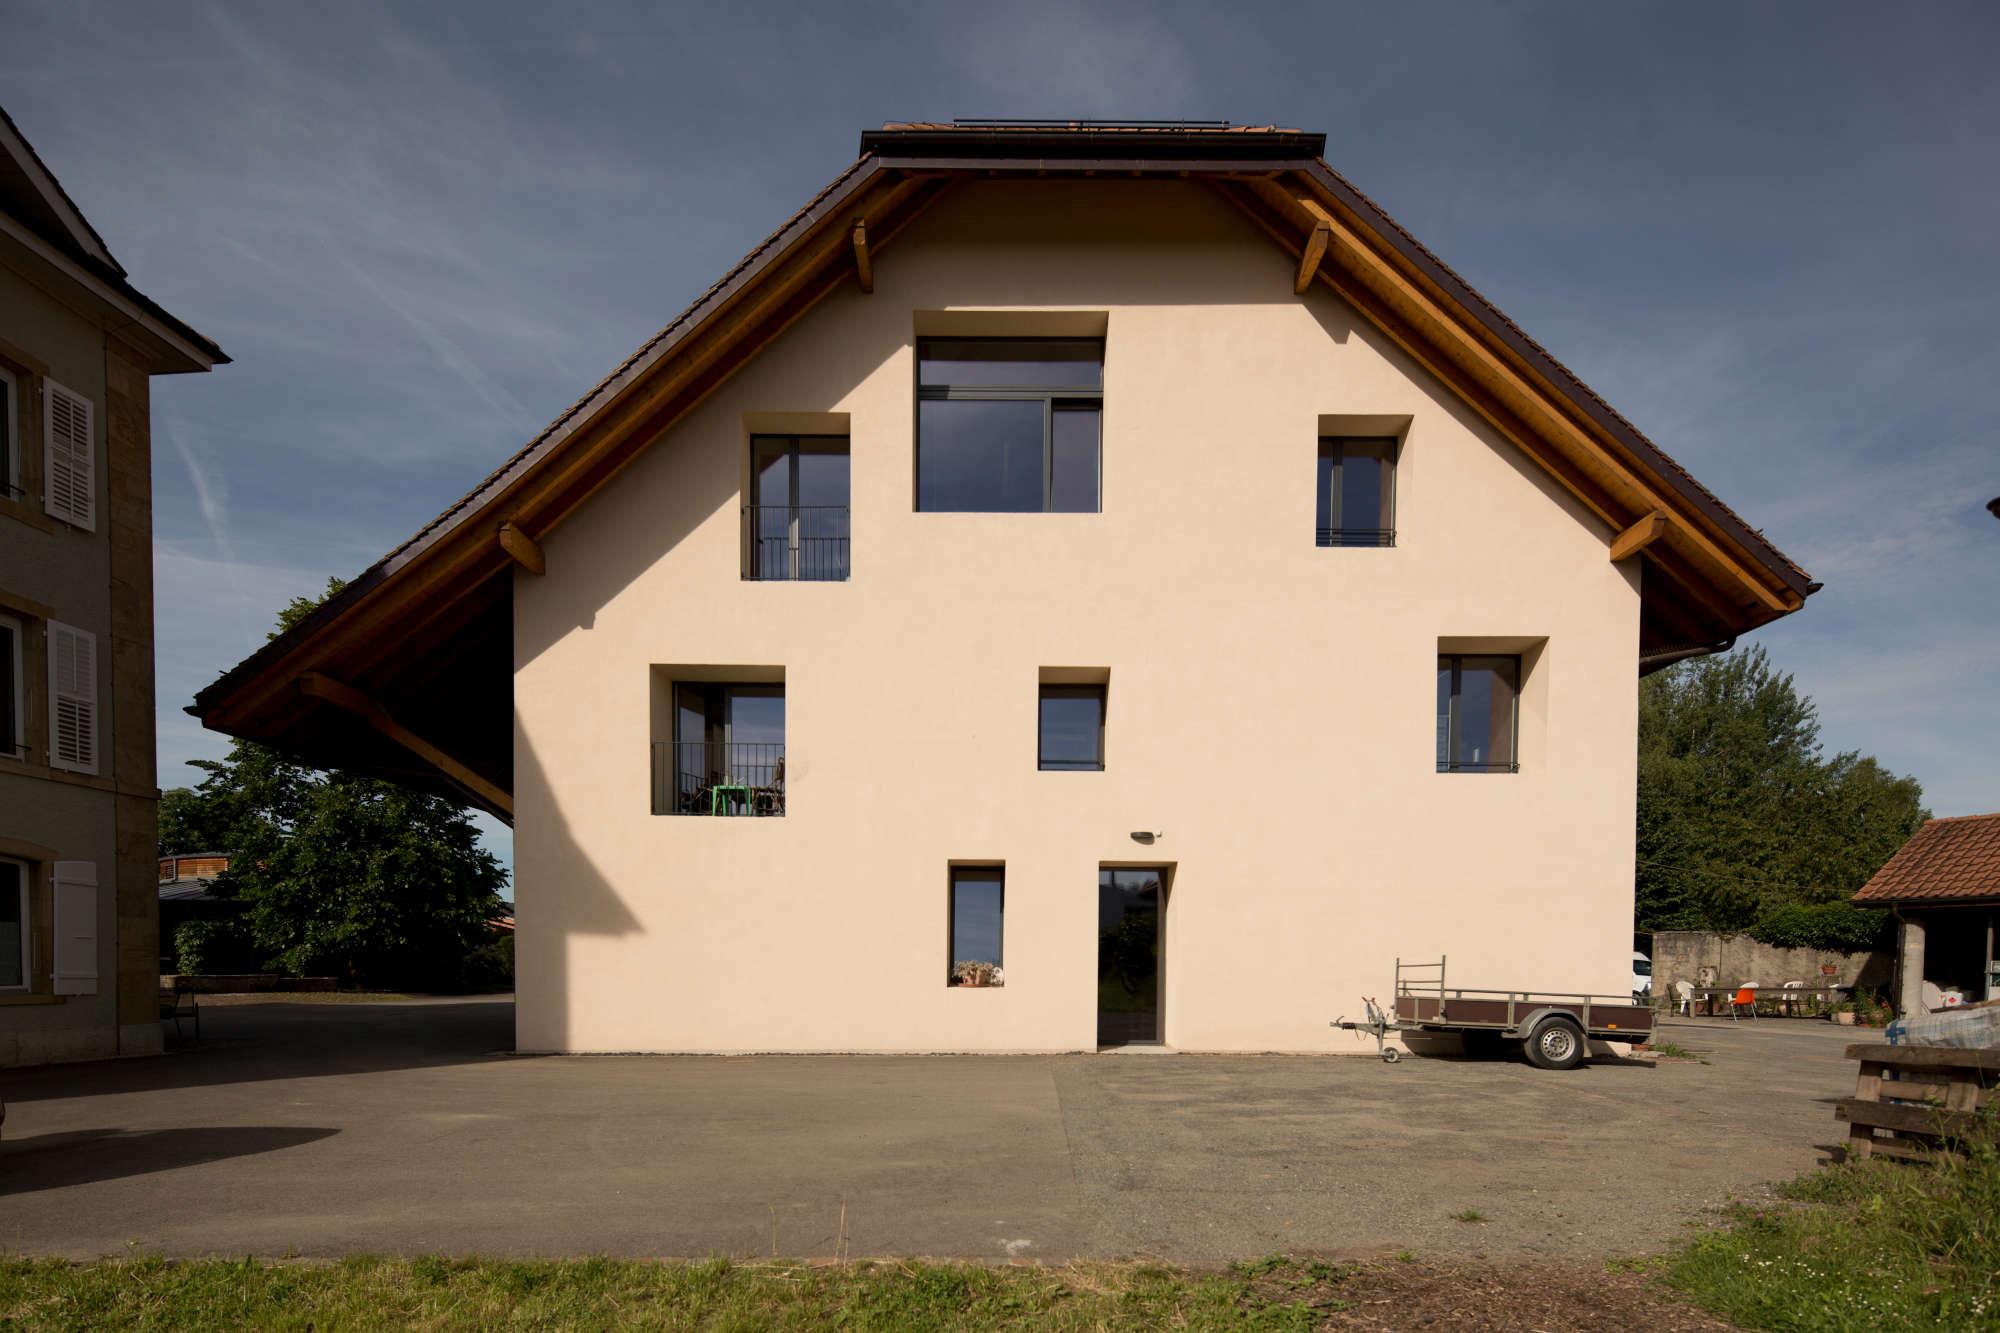 Frontfassade Ateliers.jpg